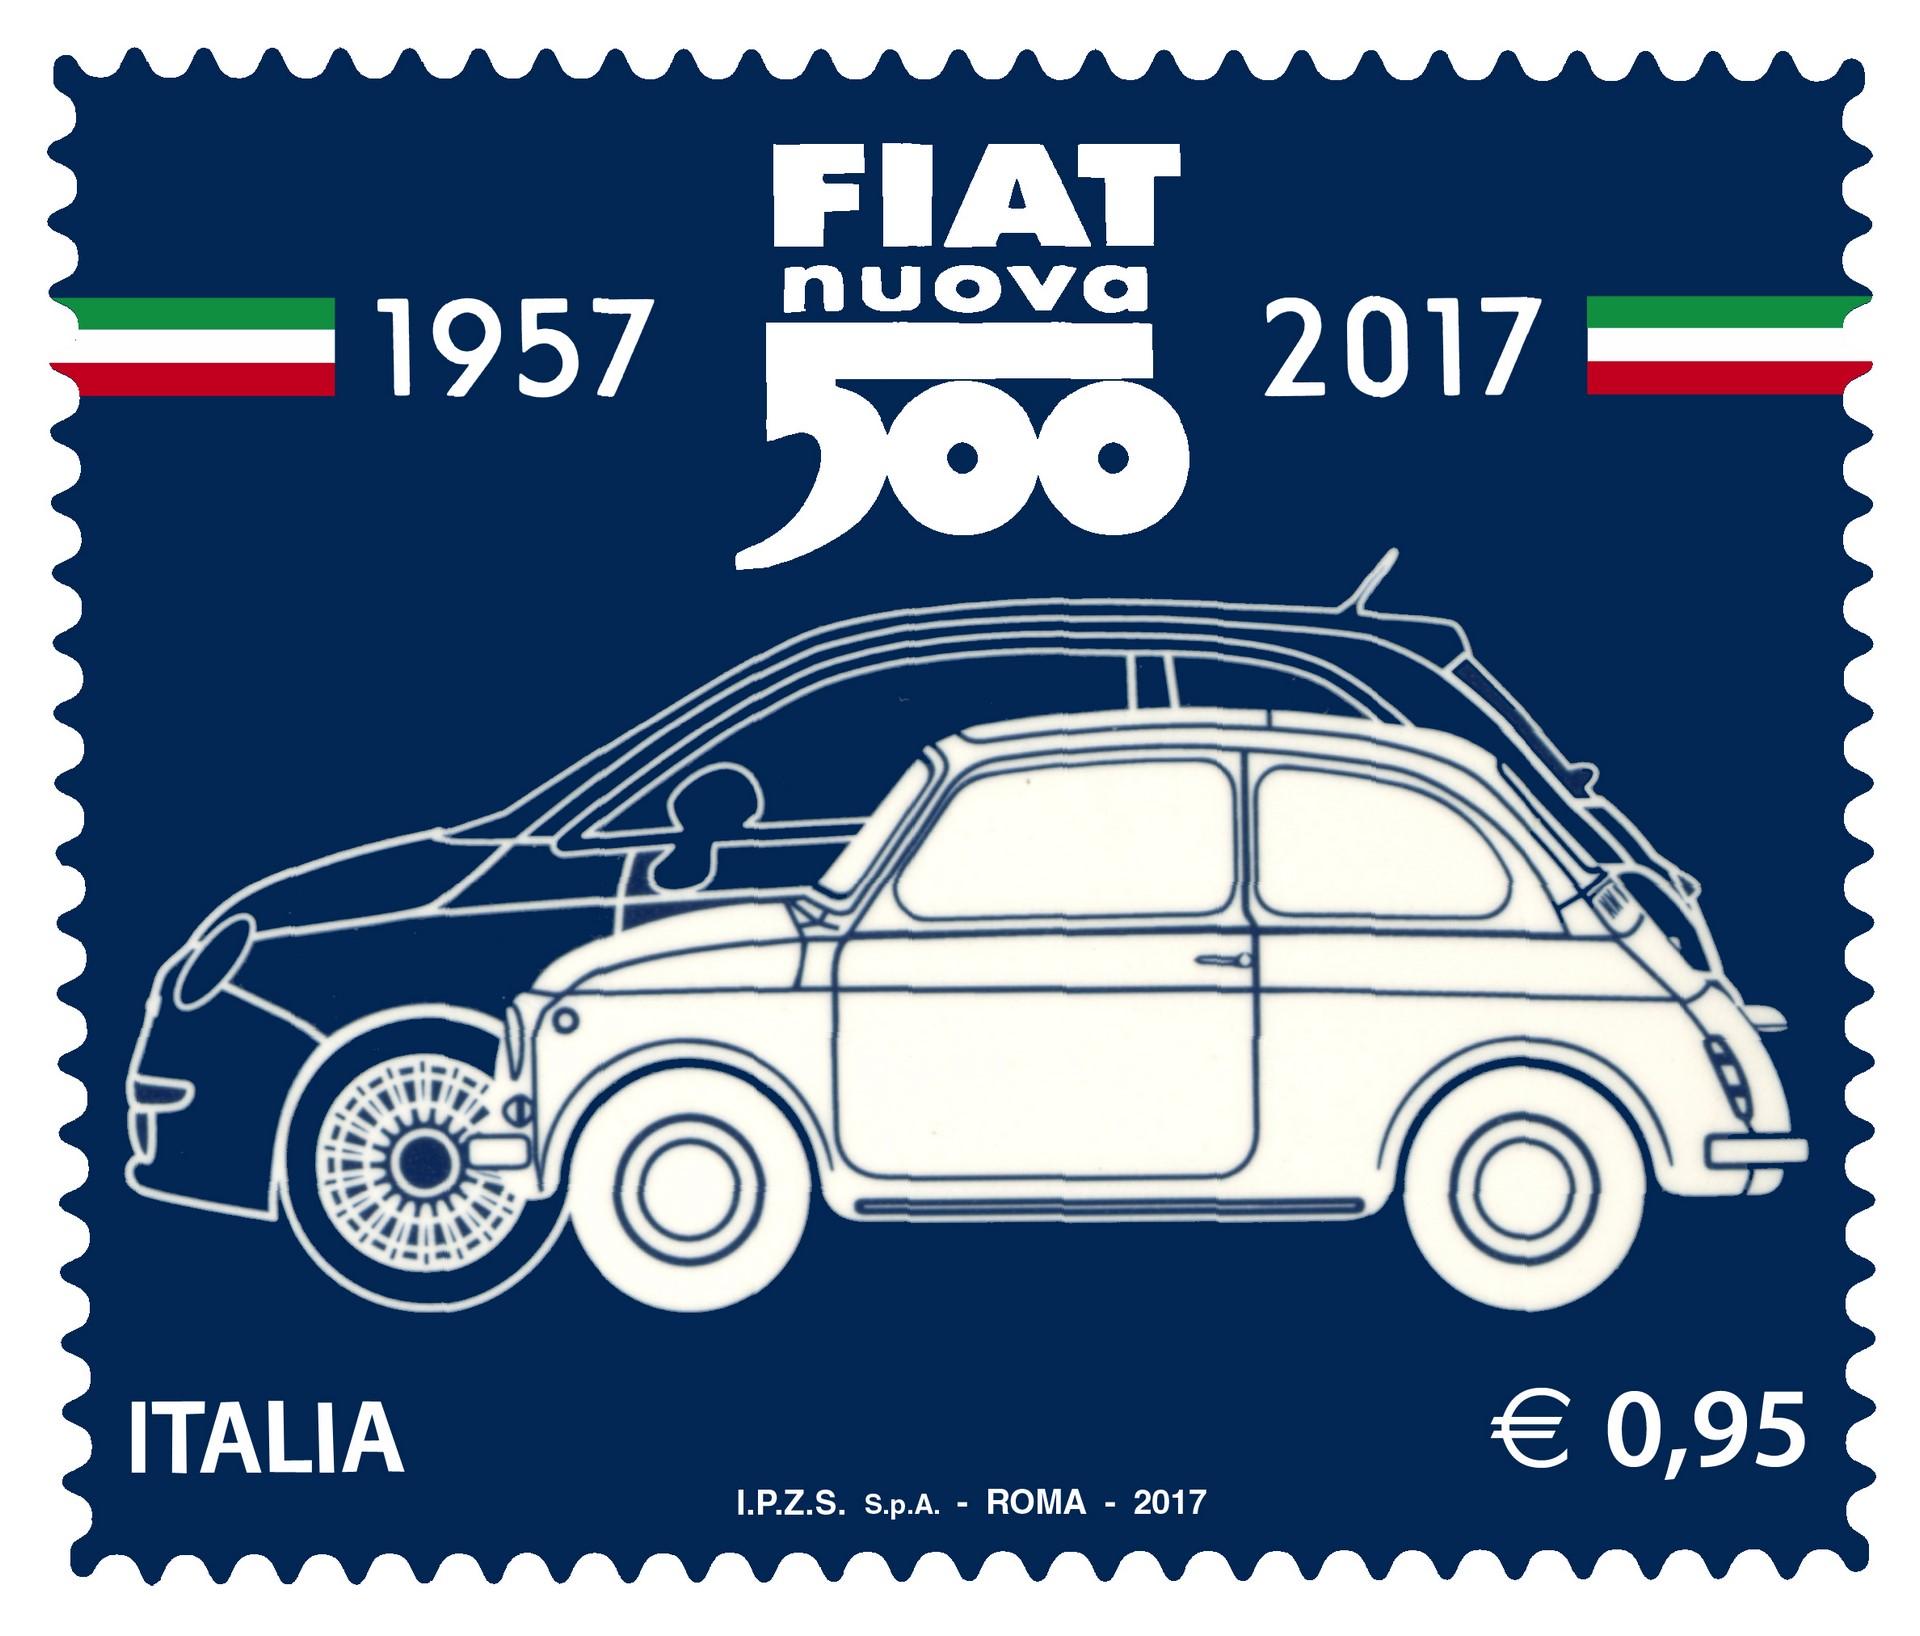 Fiat 500 stamp (27)